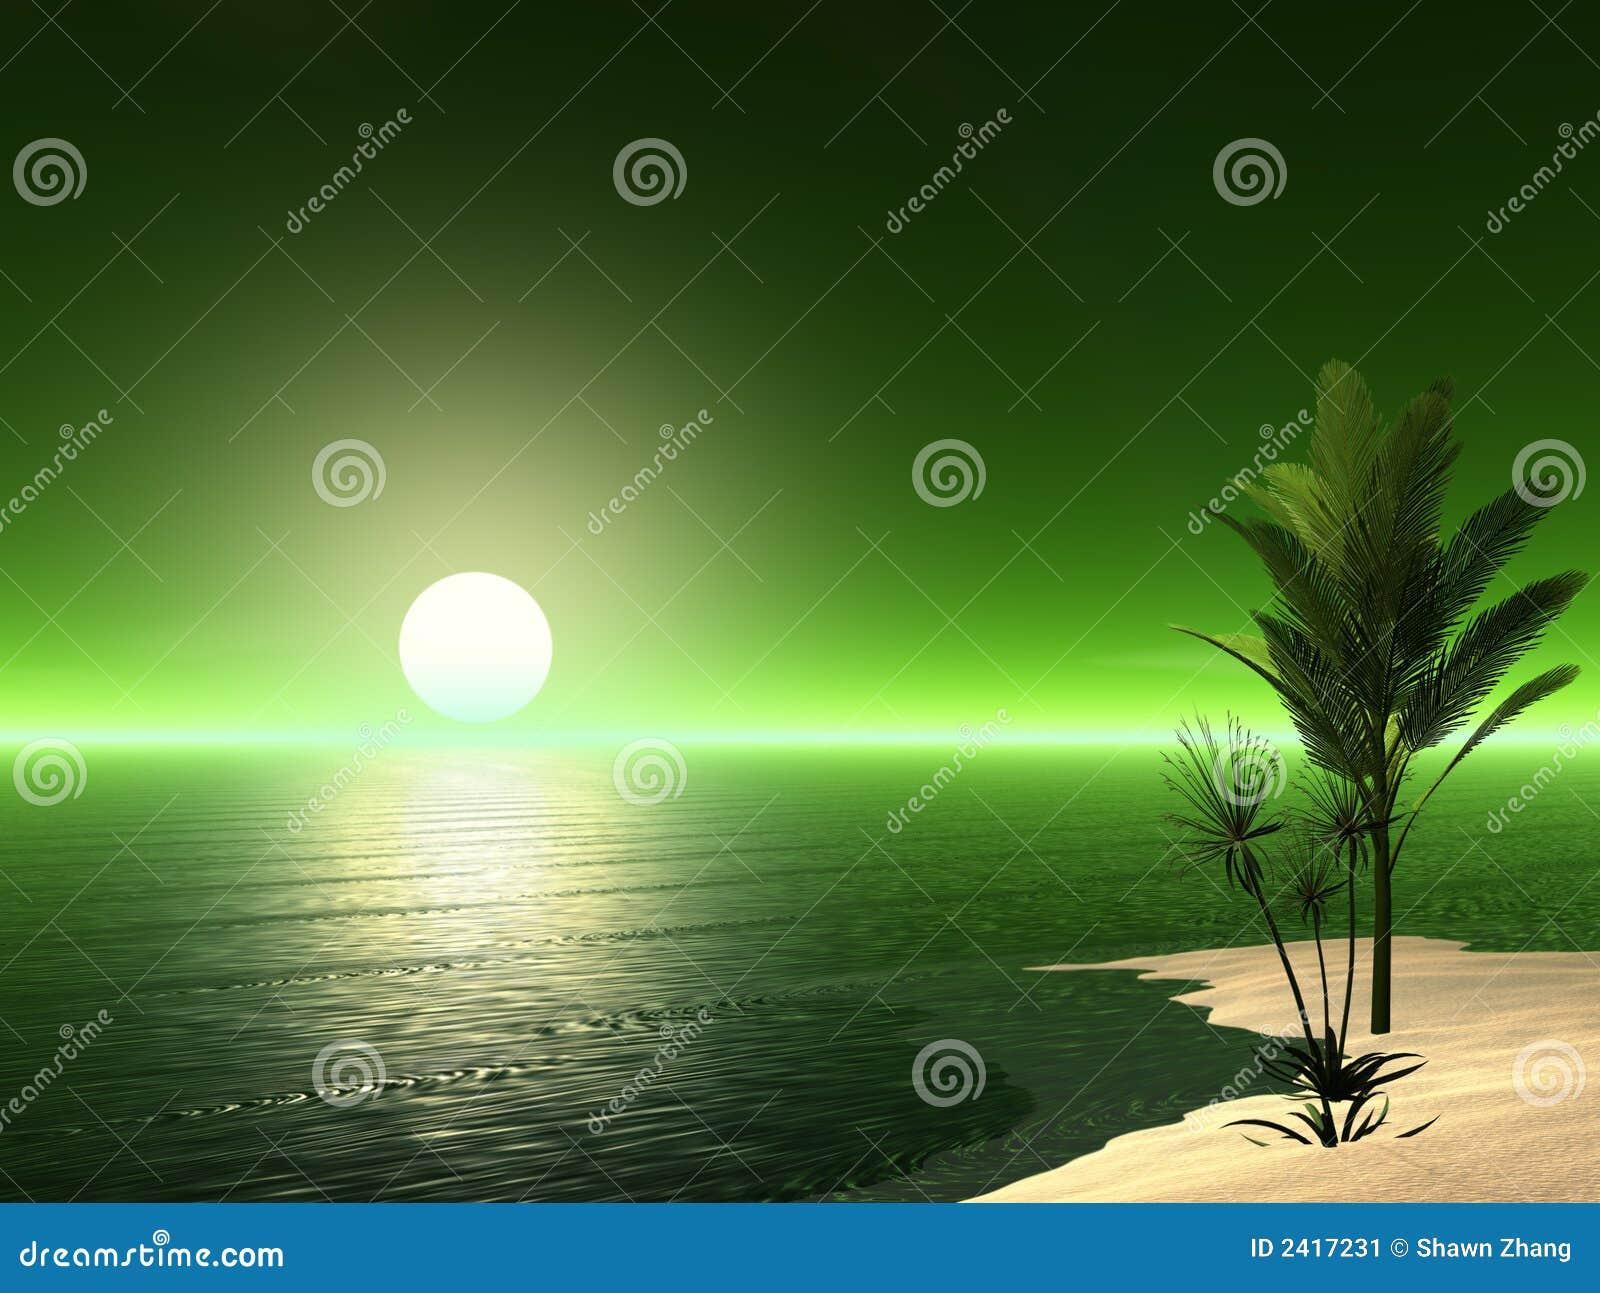 Schöne tropische Szene